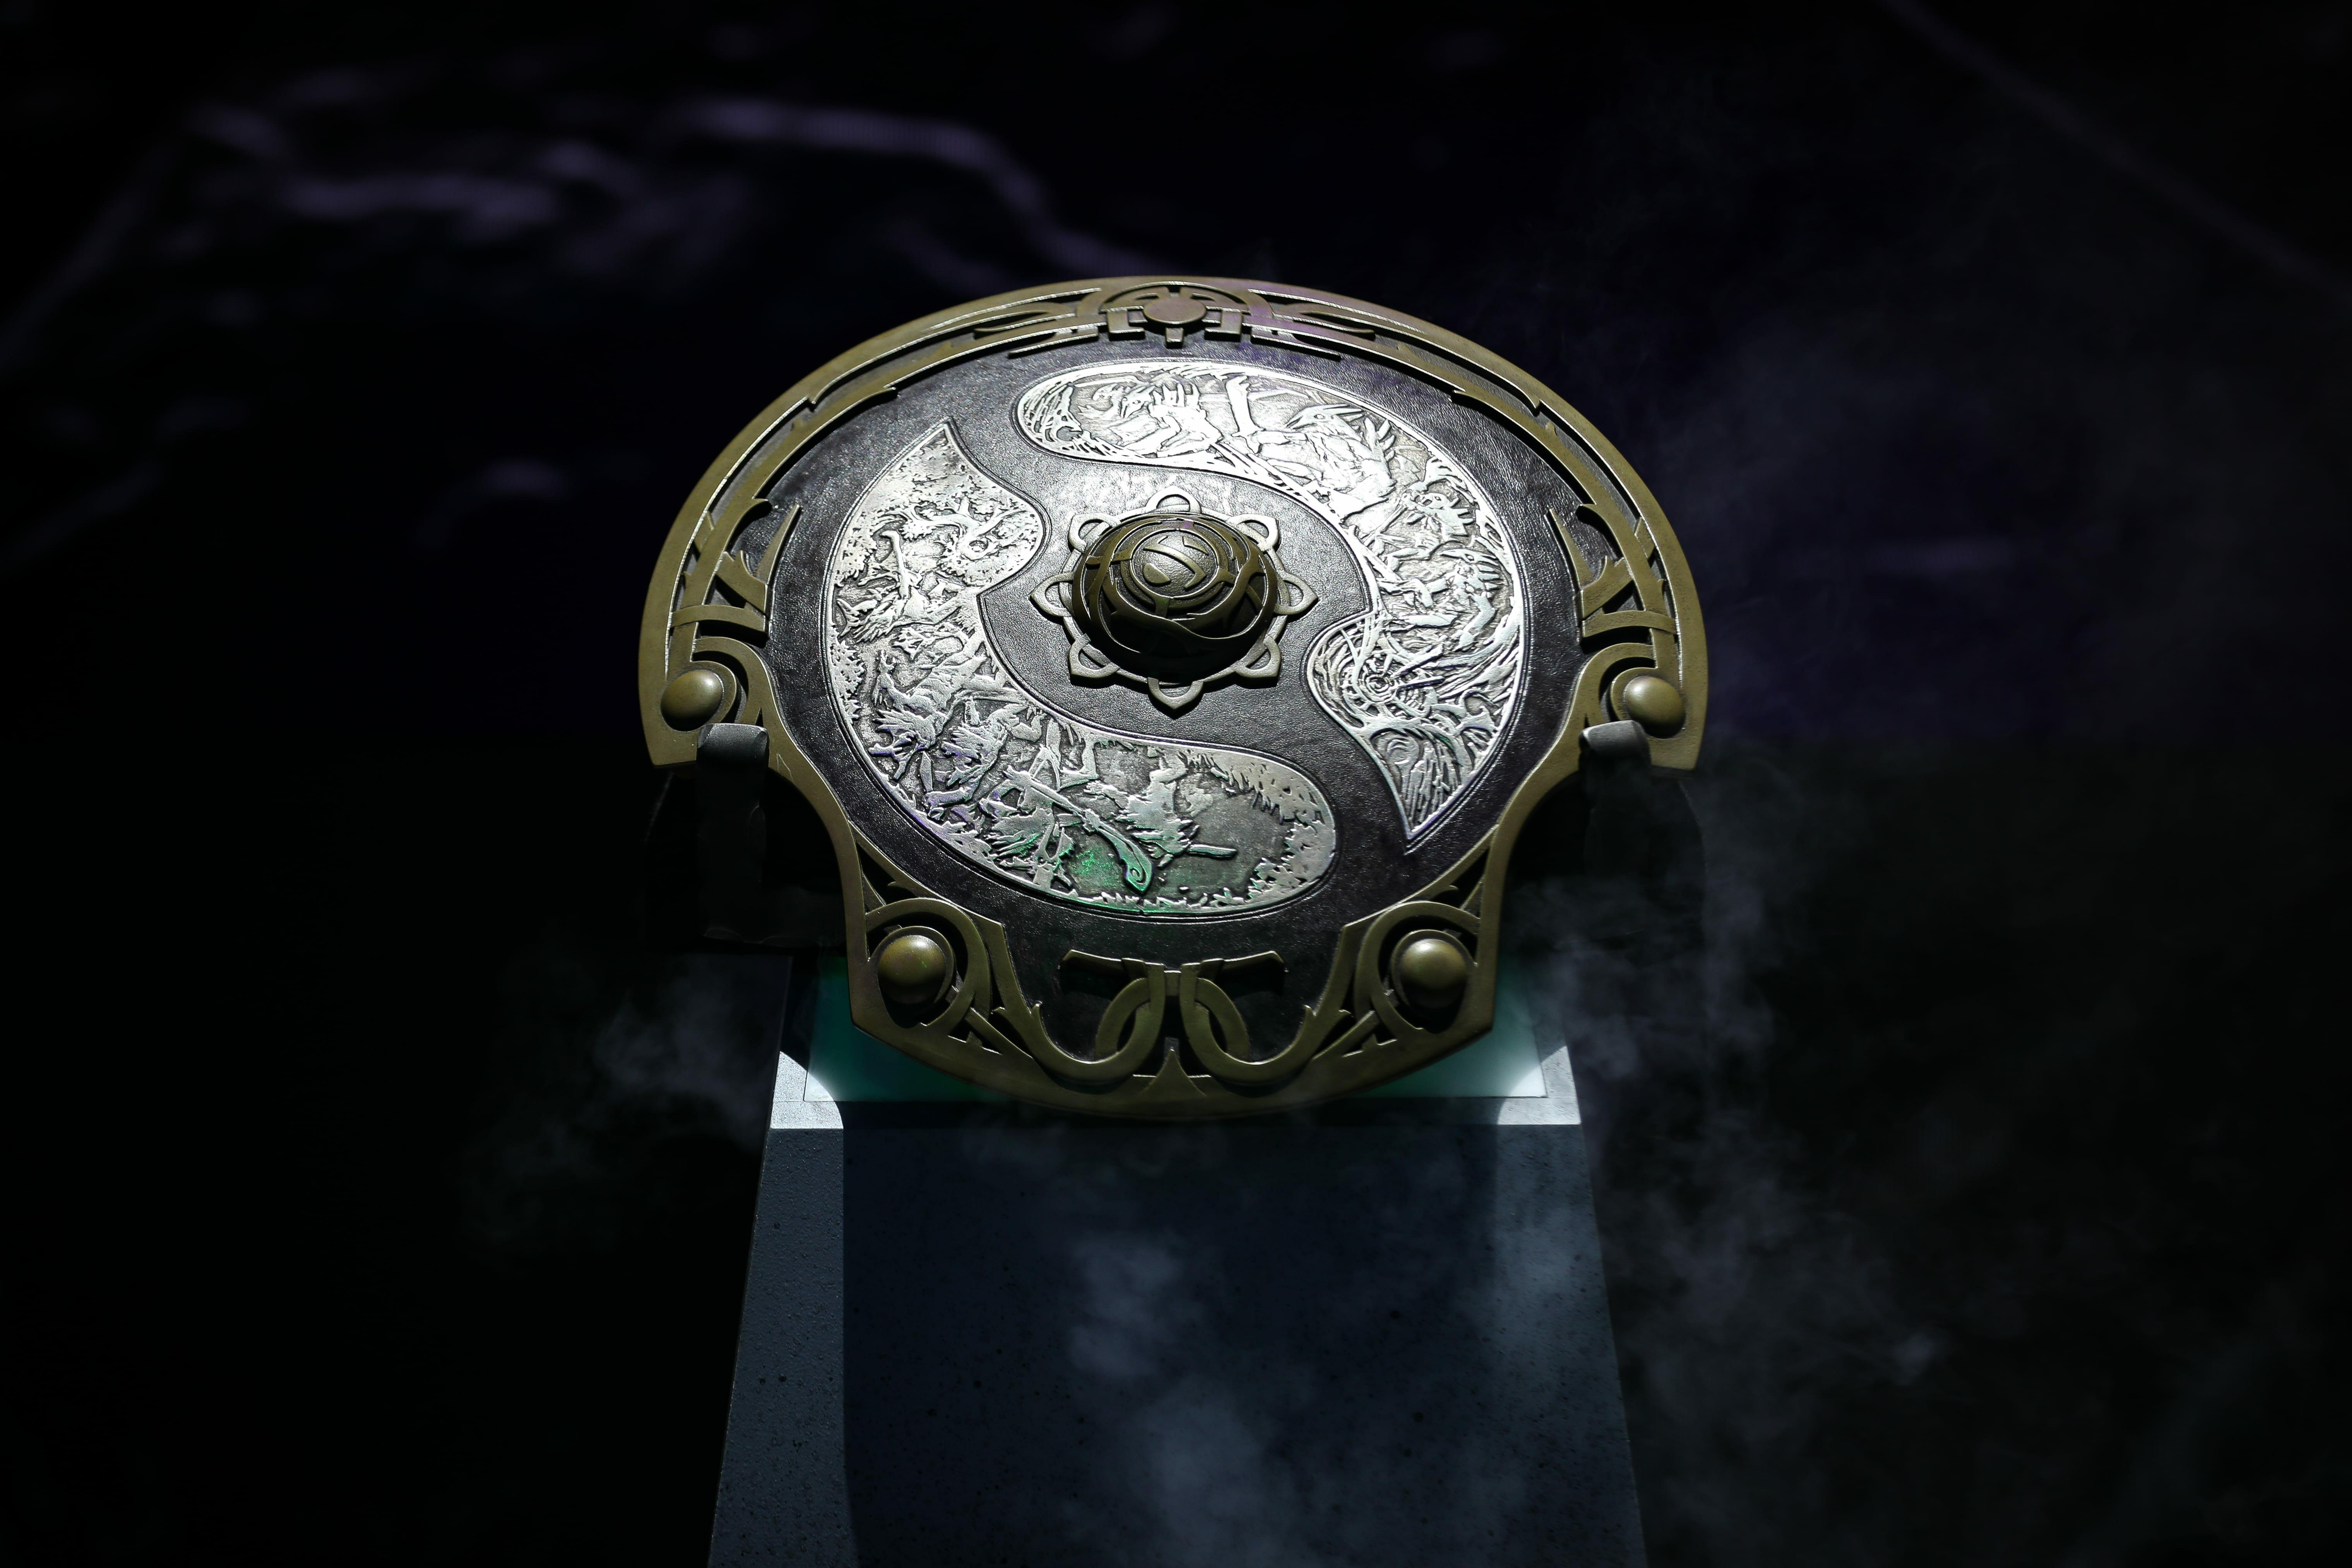 Dota 2 Aegis of Champions